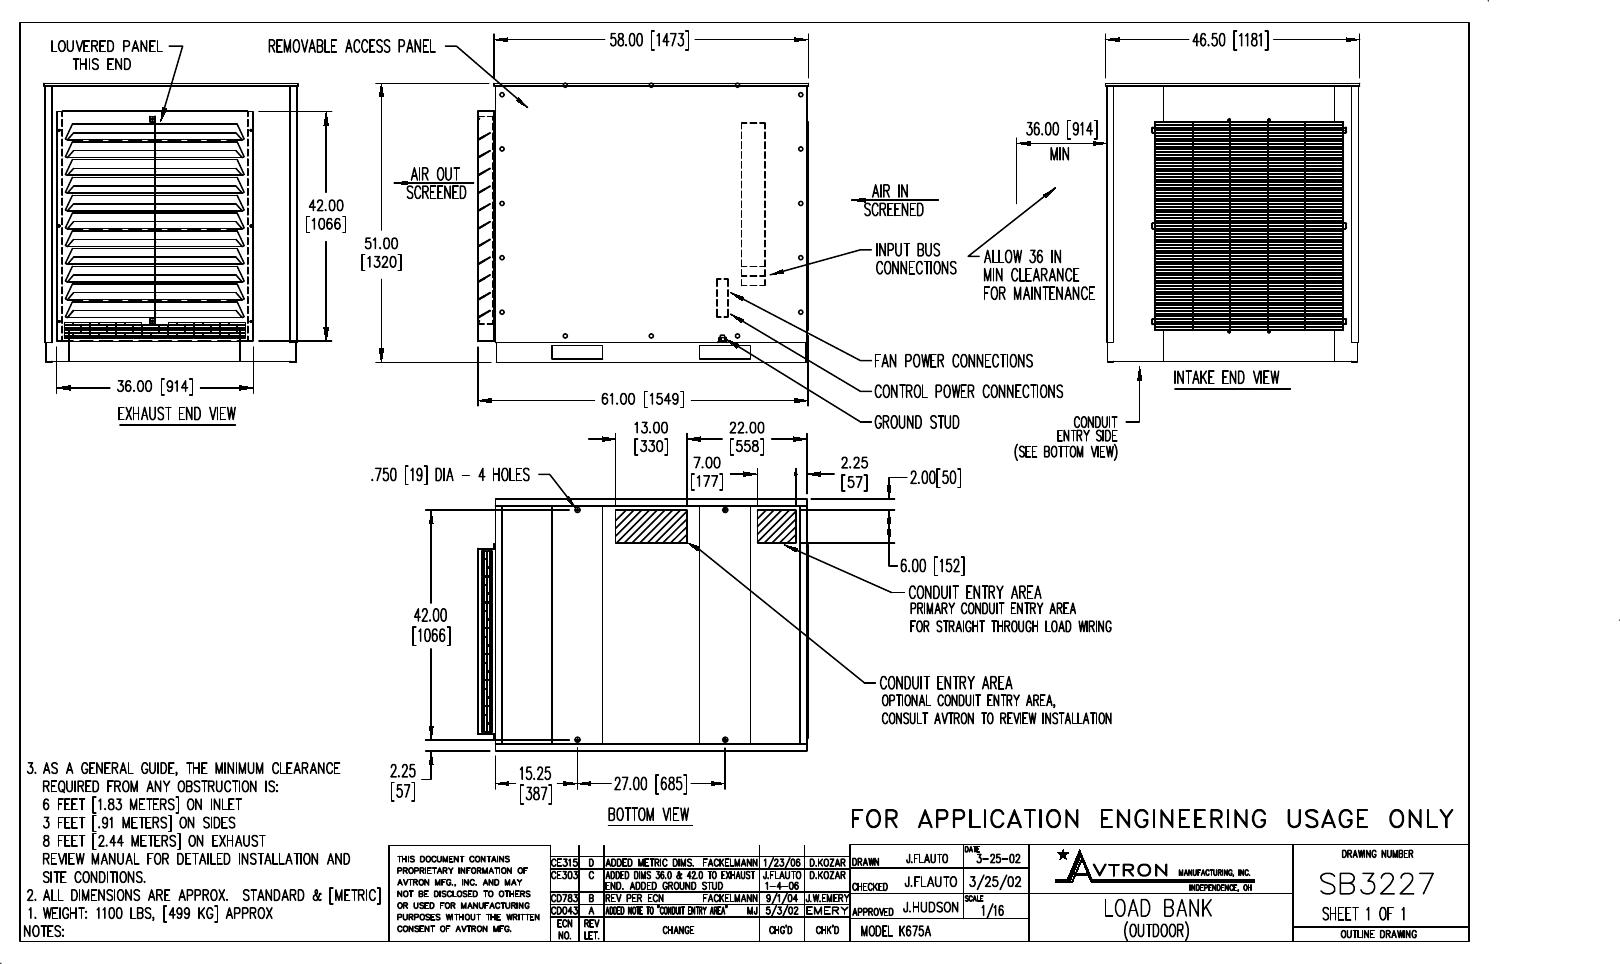 Load Bank Wiring Diagram